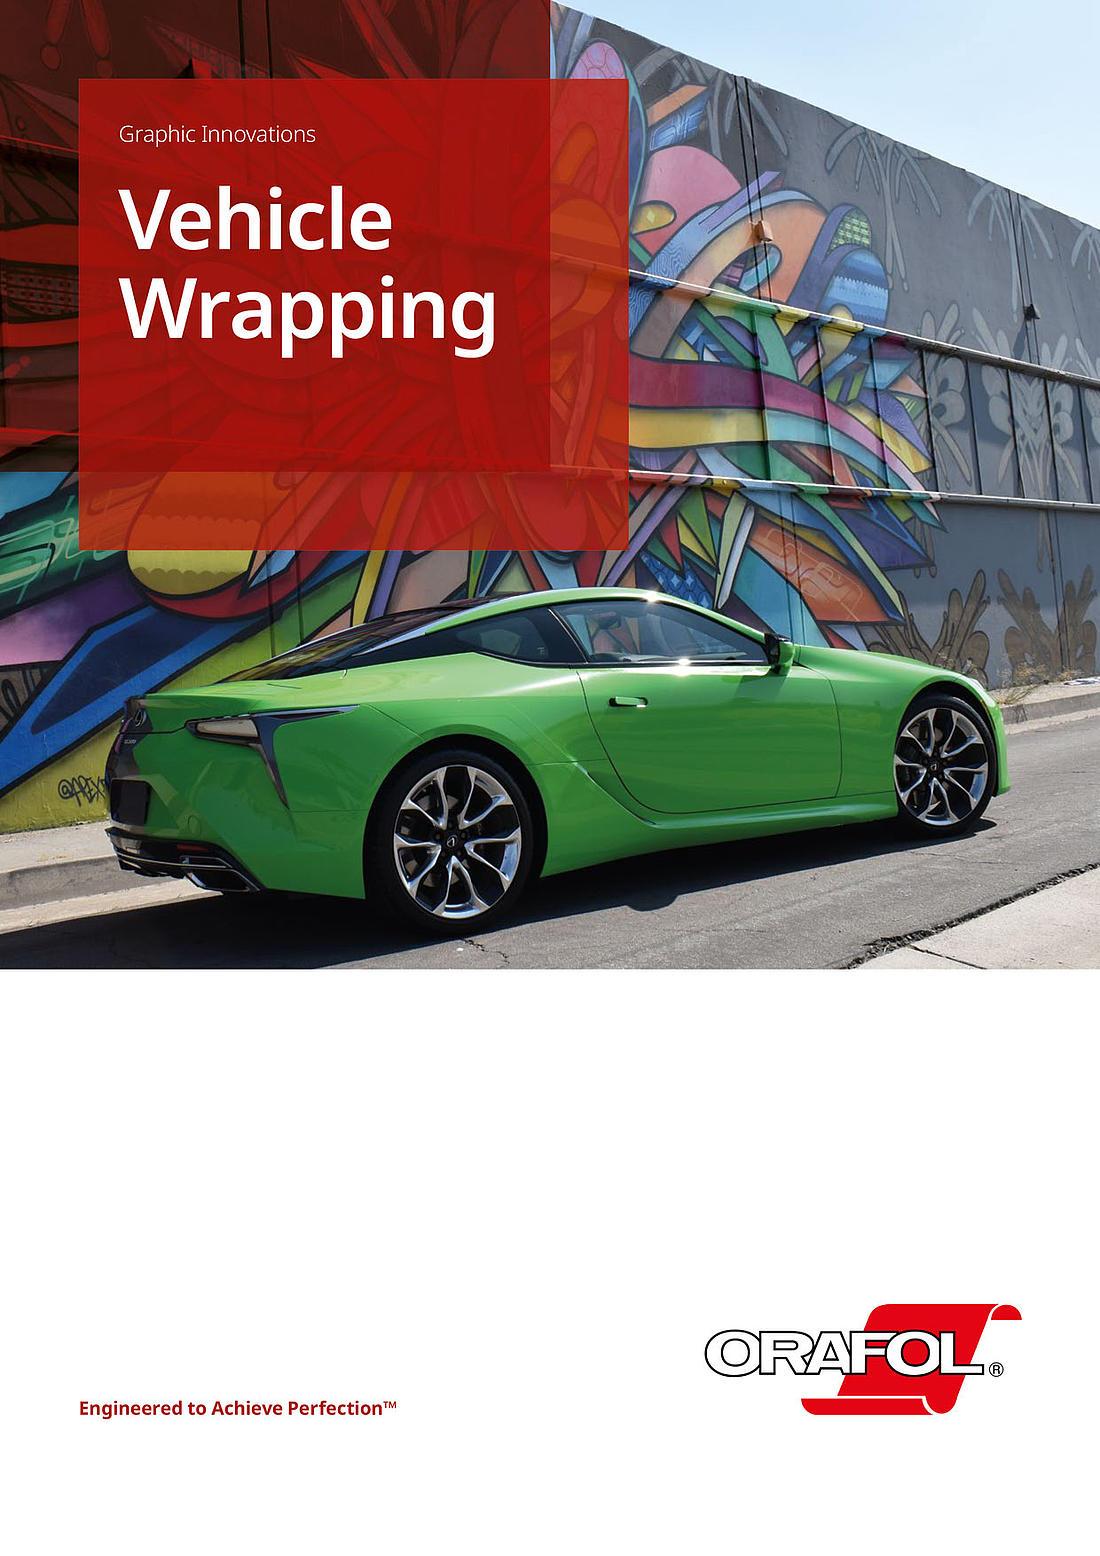 ORACAL® 970 Premium Wrapping Cast: ORAFOL Europe